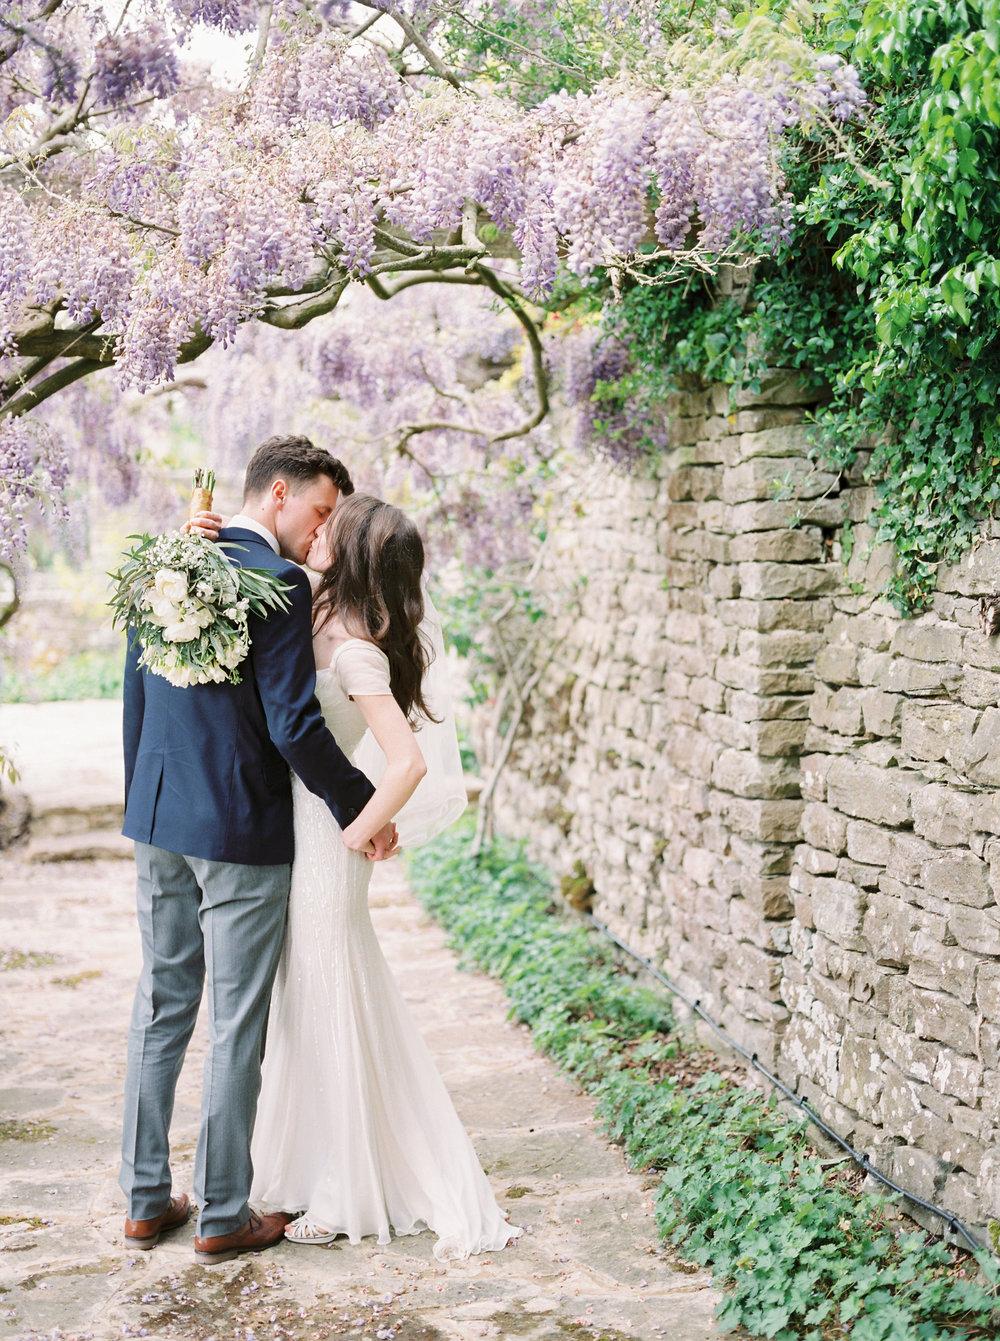 PETE & JENN - CHELTENHAM WEDDING